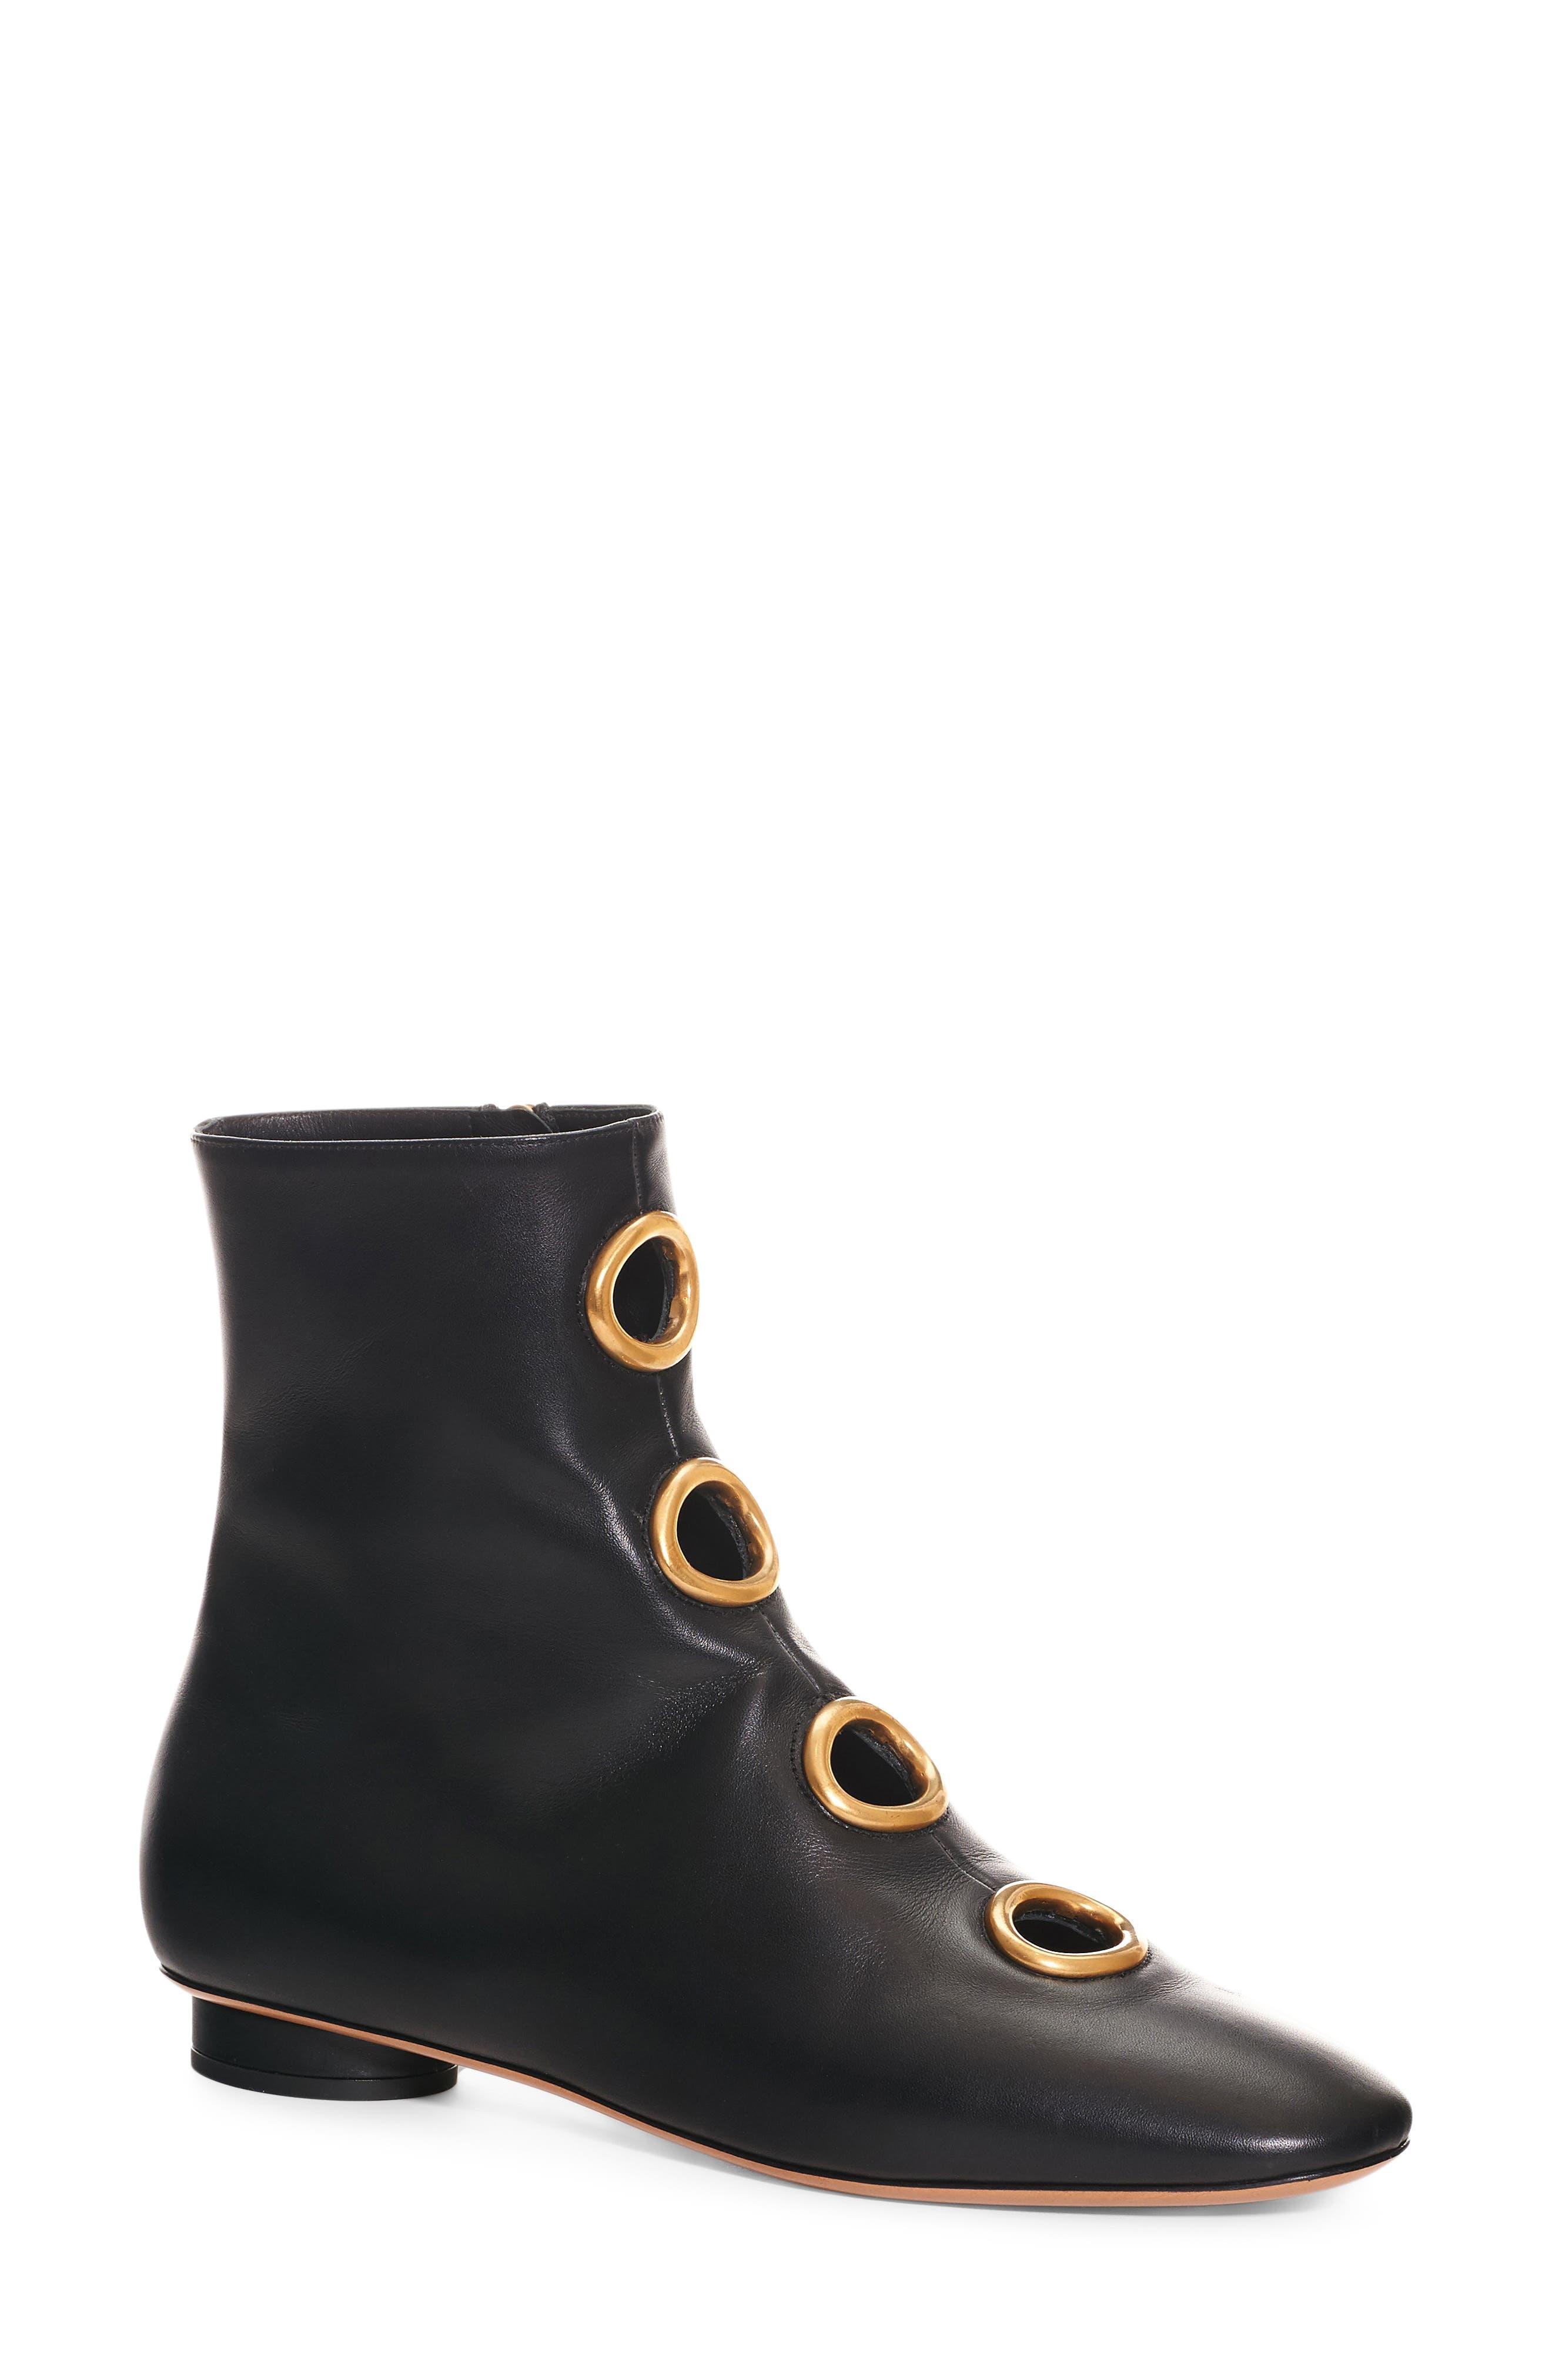 VALENTINO GARAVANI Grommet Boot